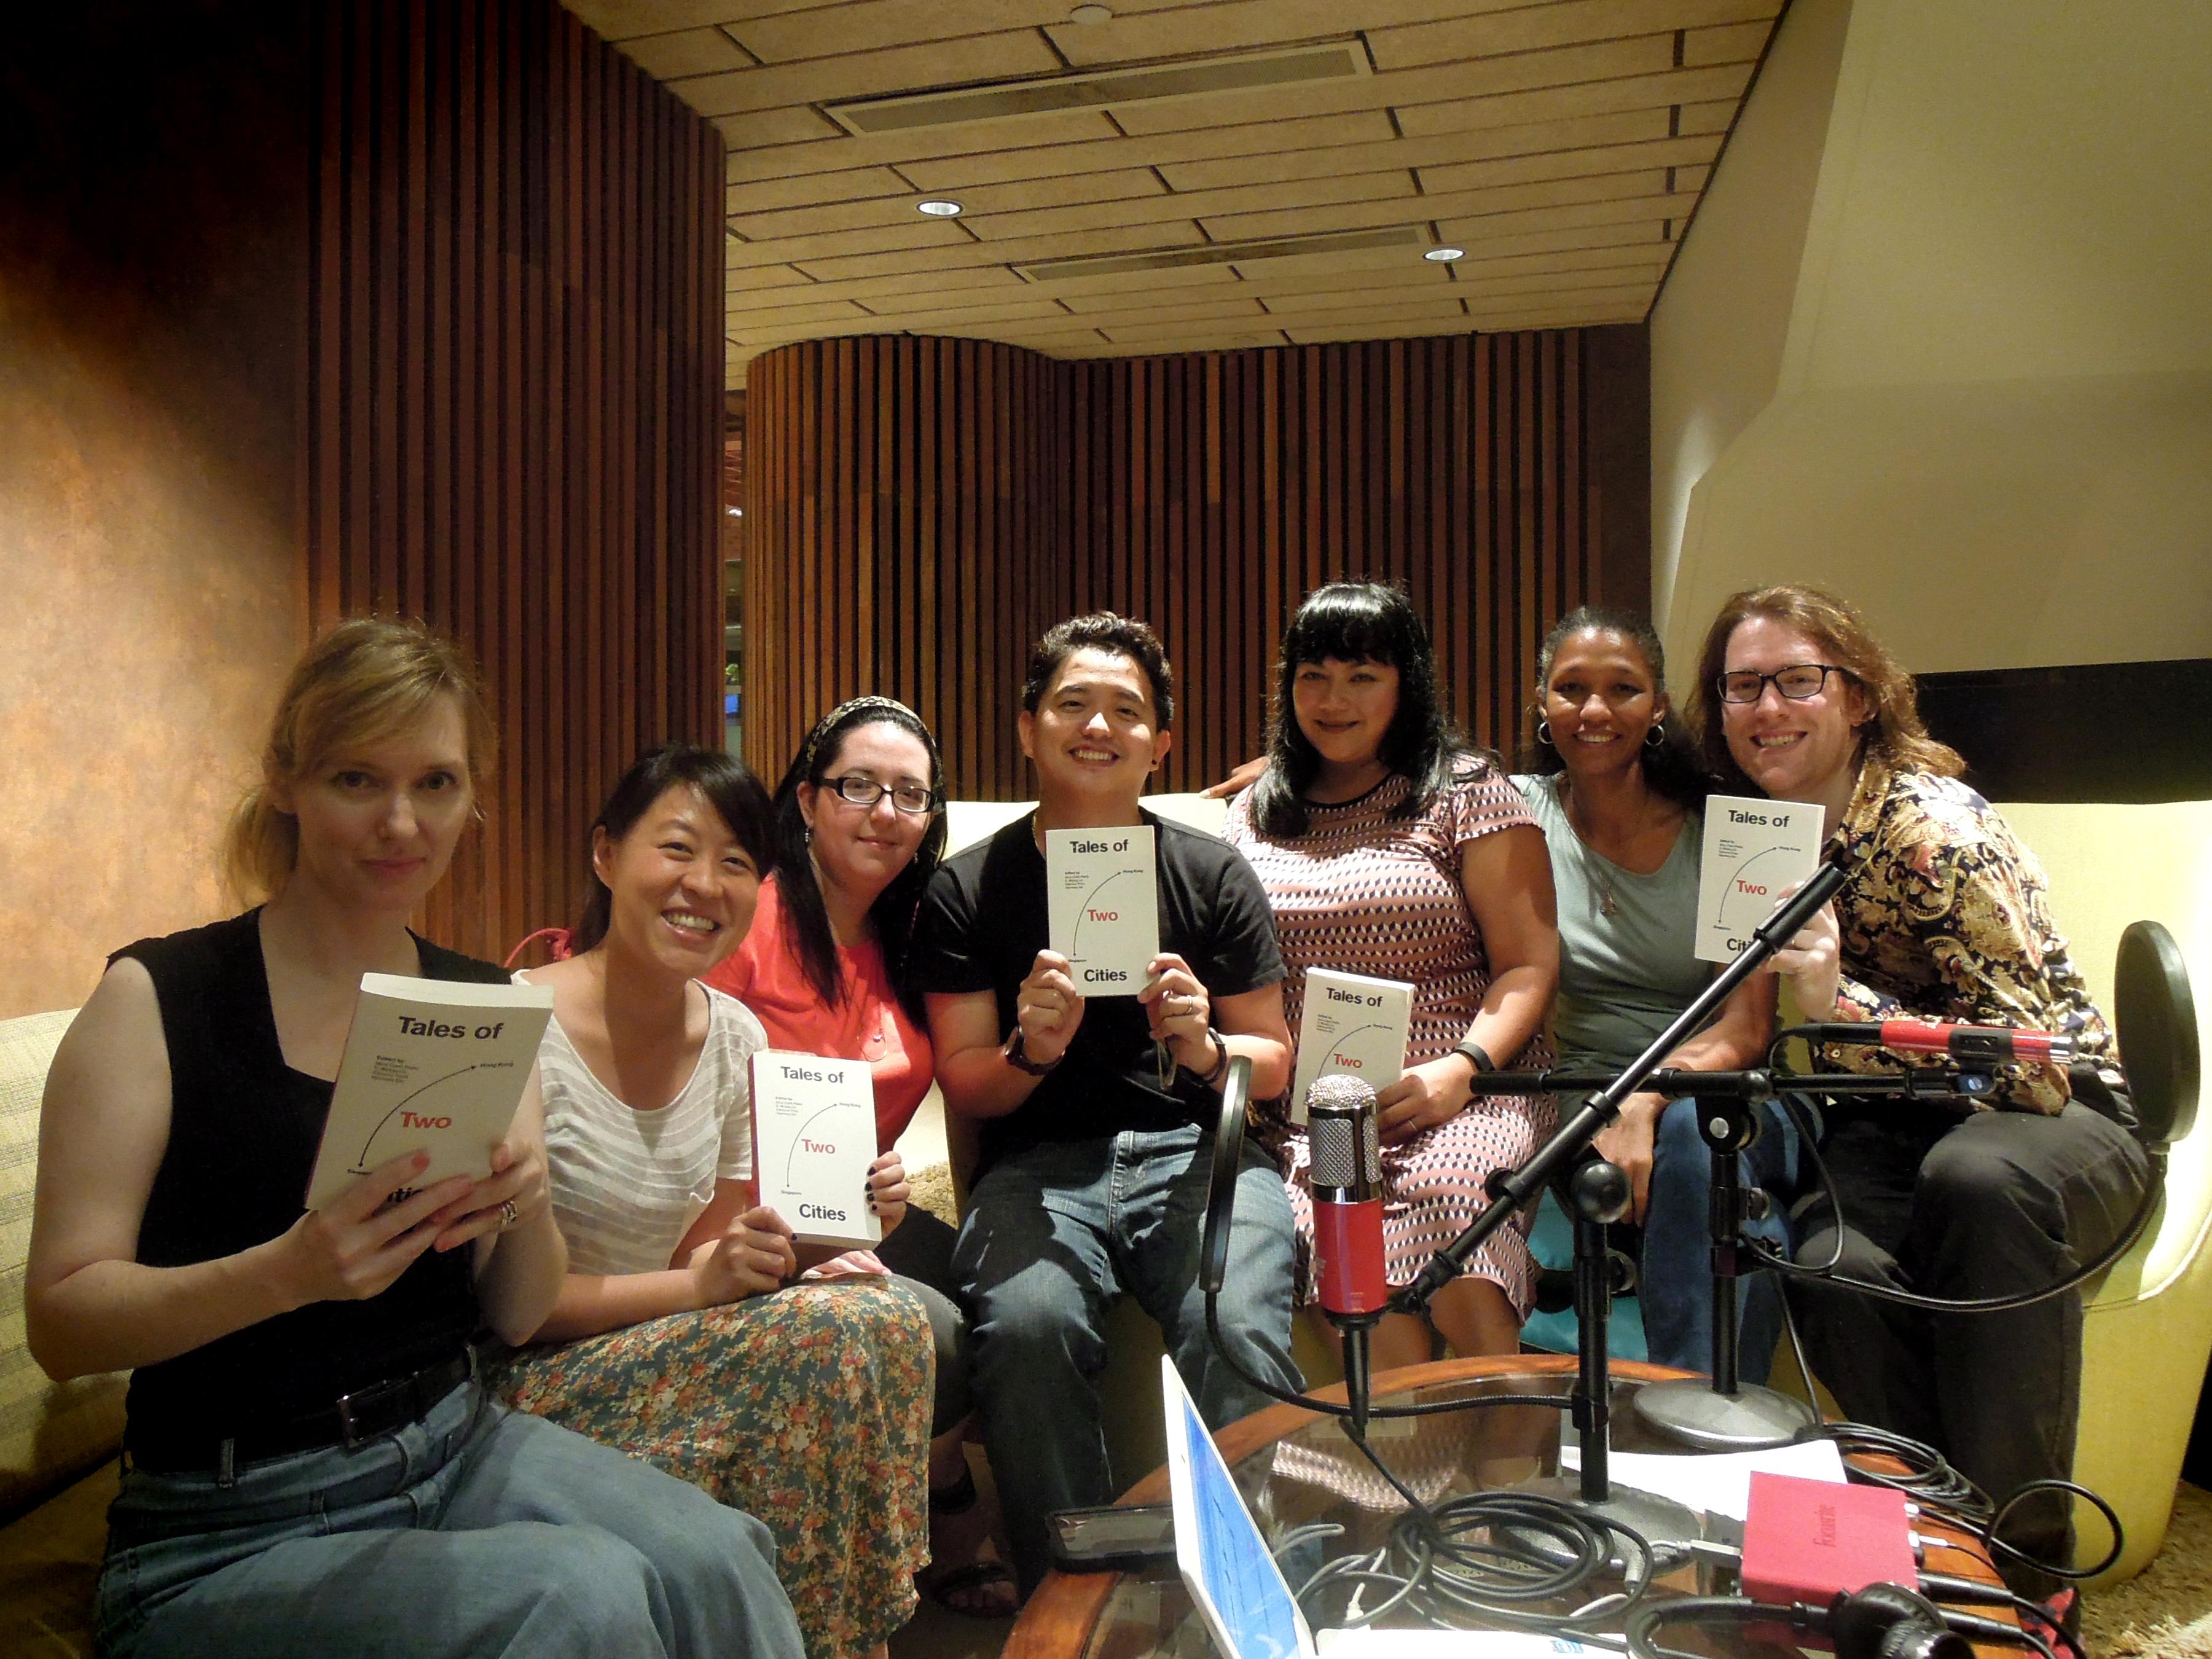 Bronwyn, Wan Phing, Magali, Mickey, Vanessa, Sebrina, Simon